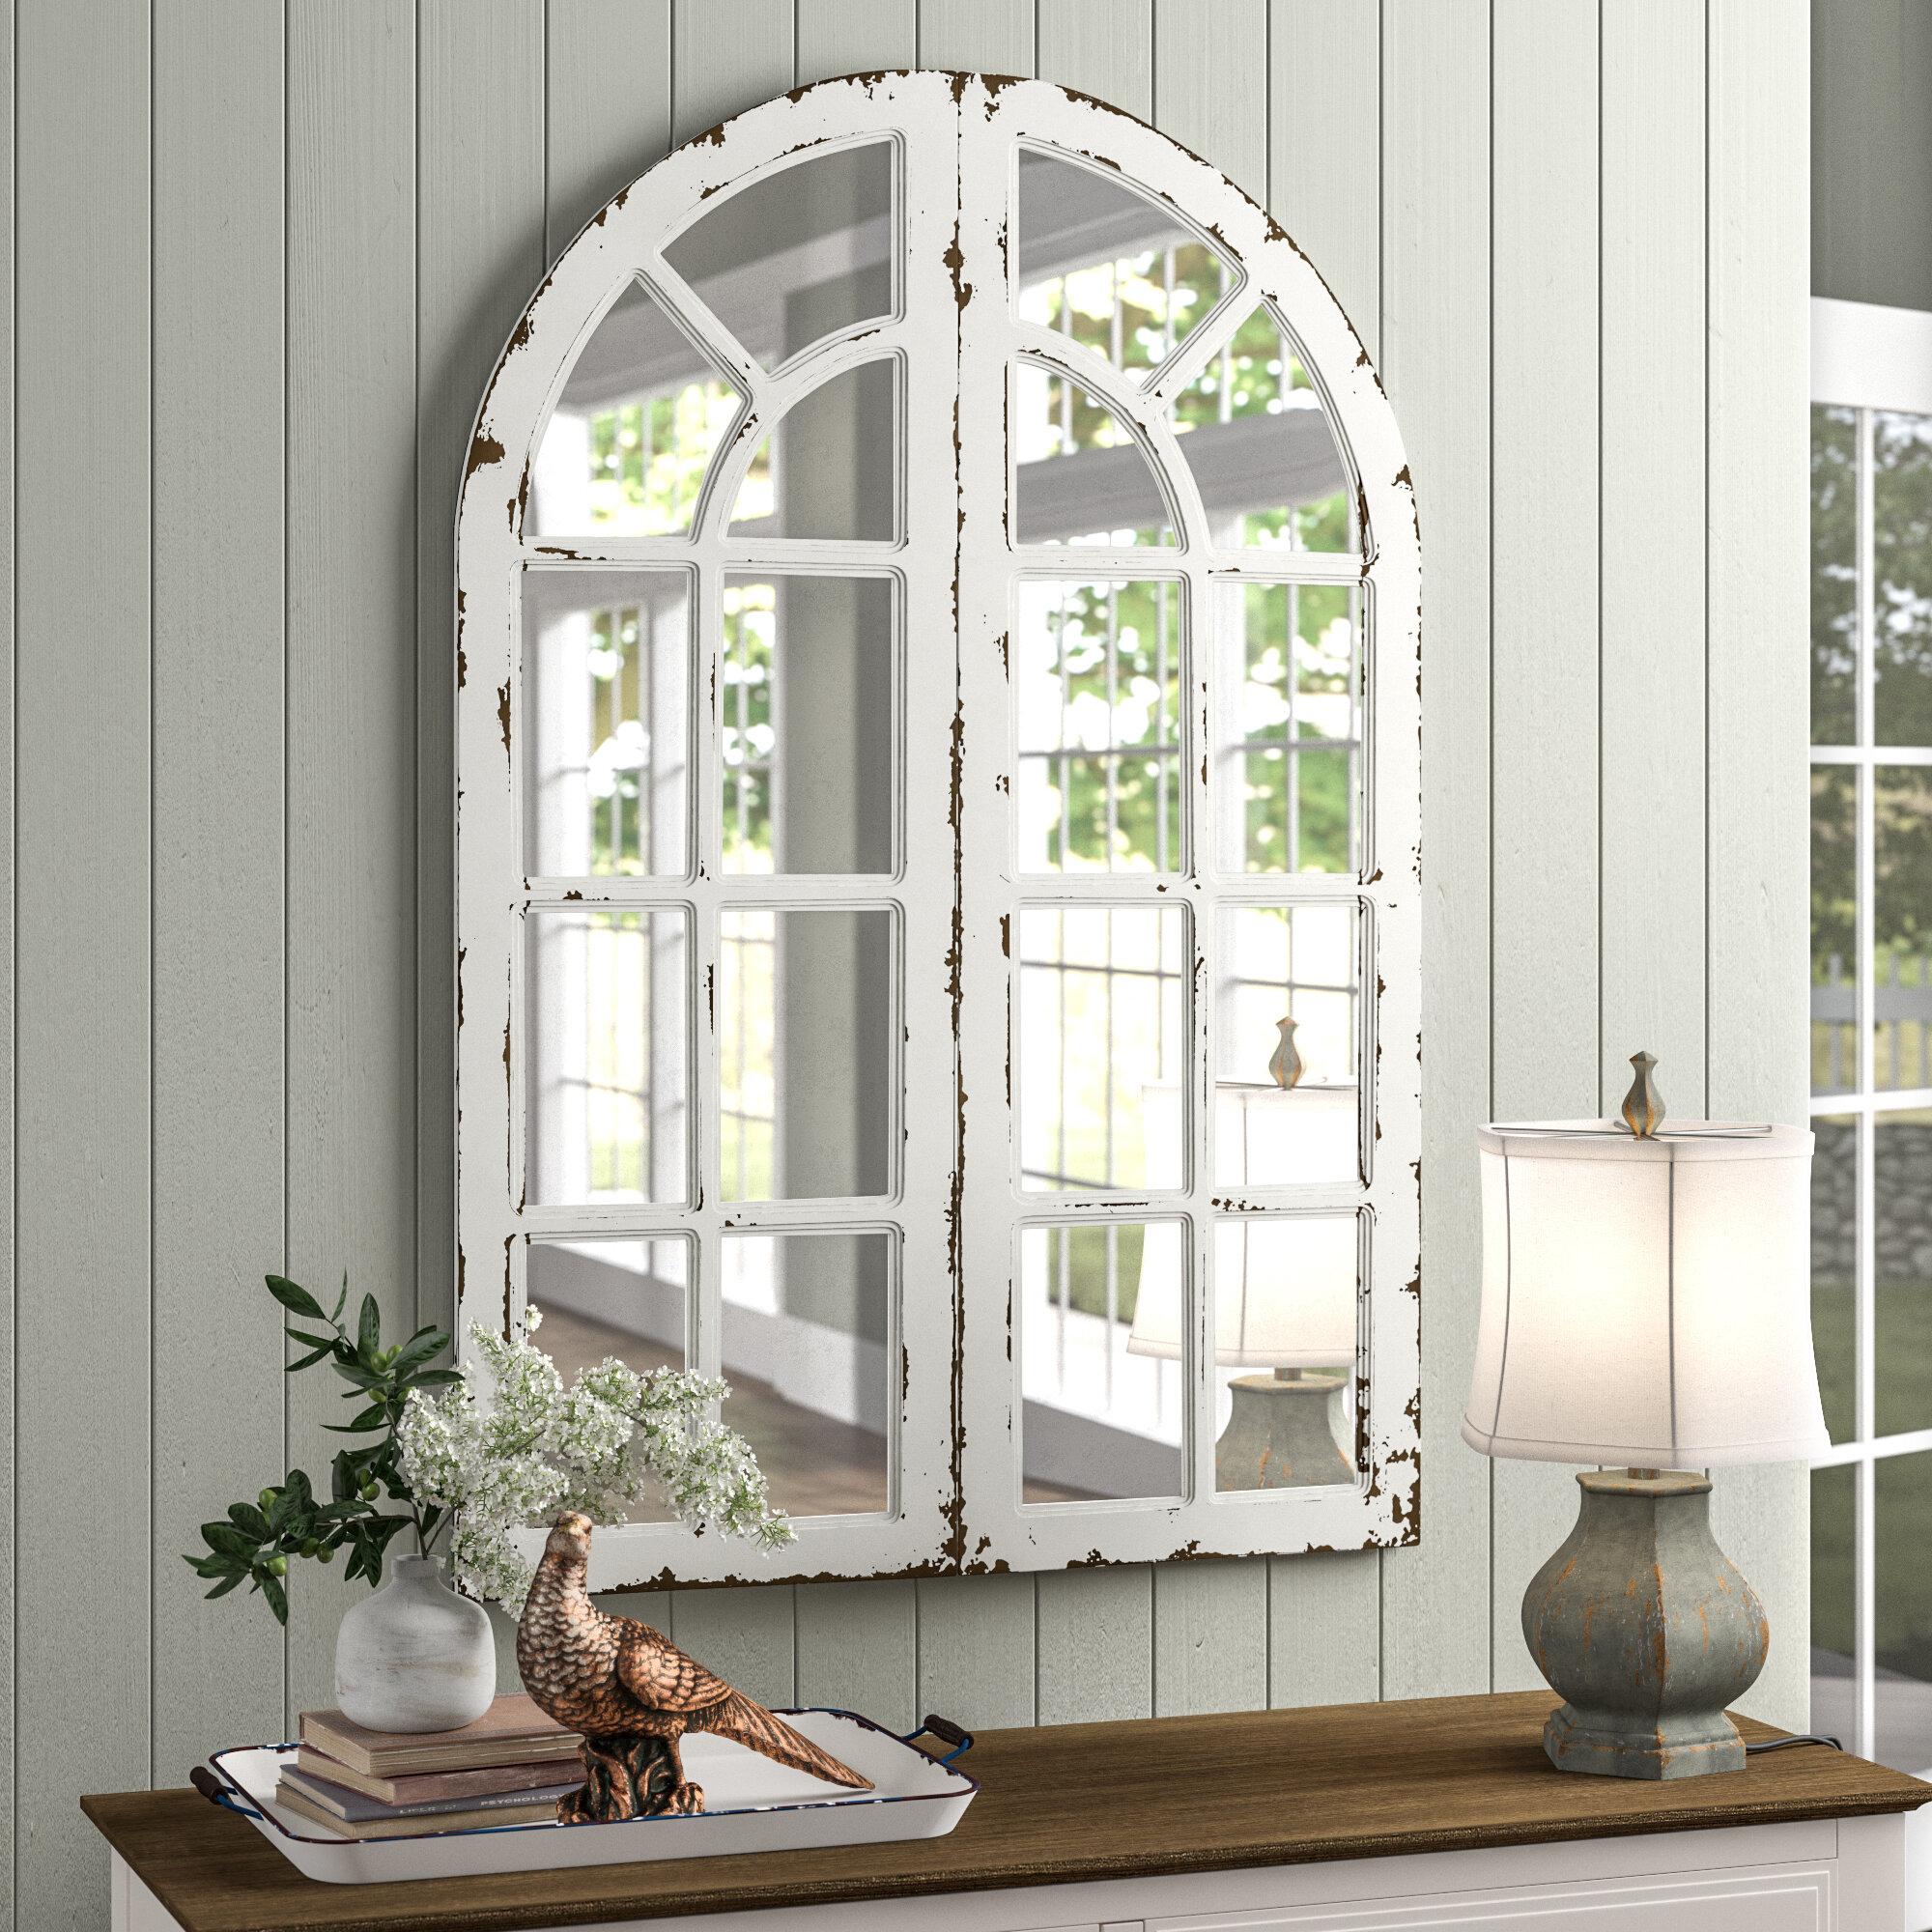 2 Piecehovis Window Panels Cottage Mirror Set Within 2 Piece Kissena Window Pane Accent Mirror Sets (View 4 of 20)